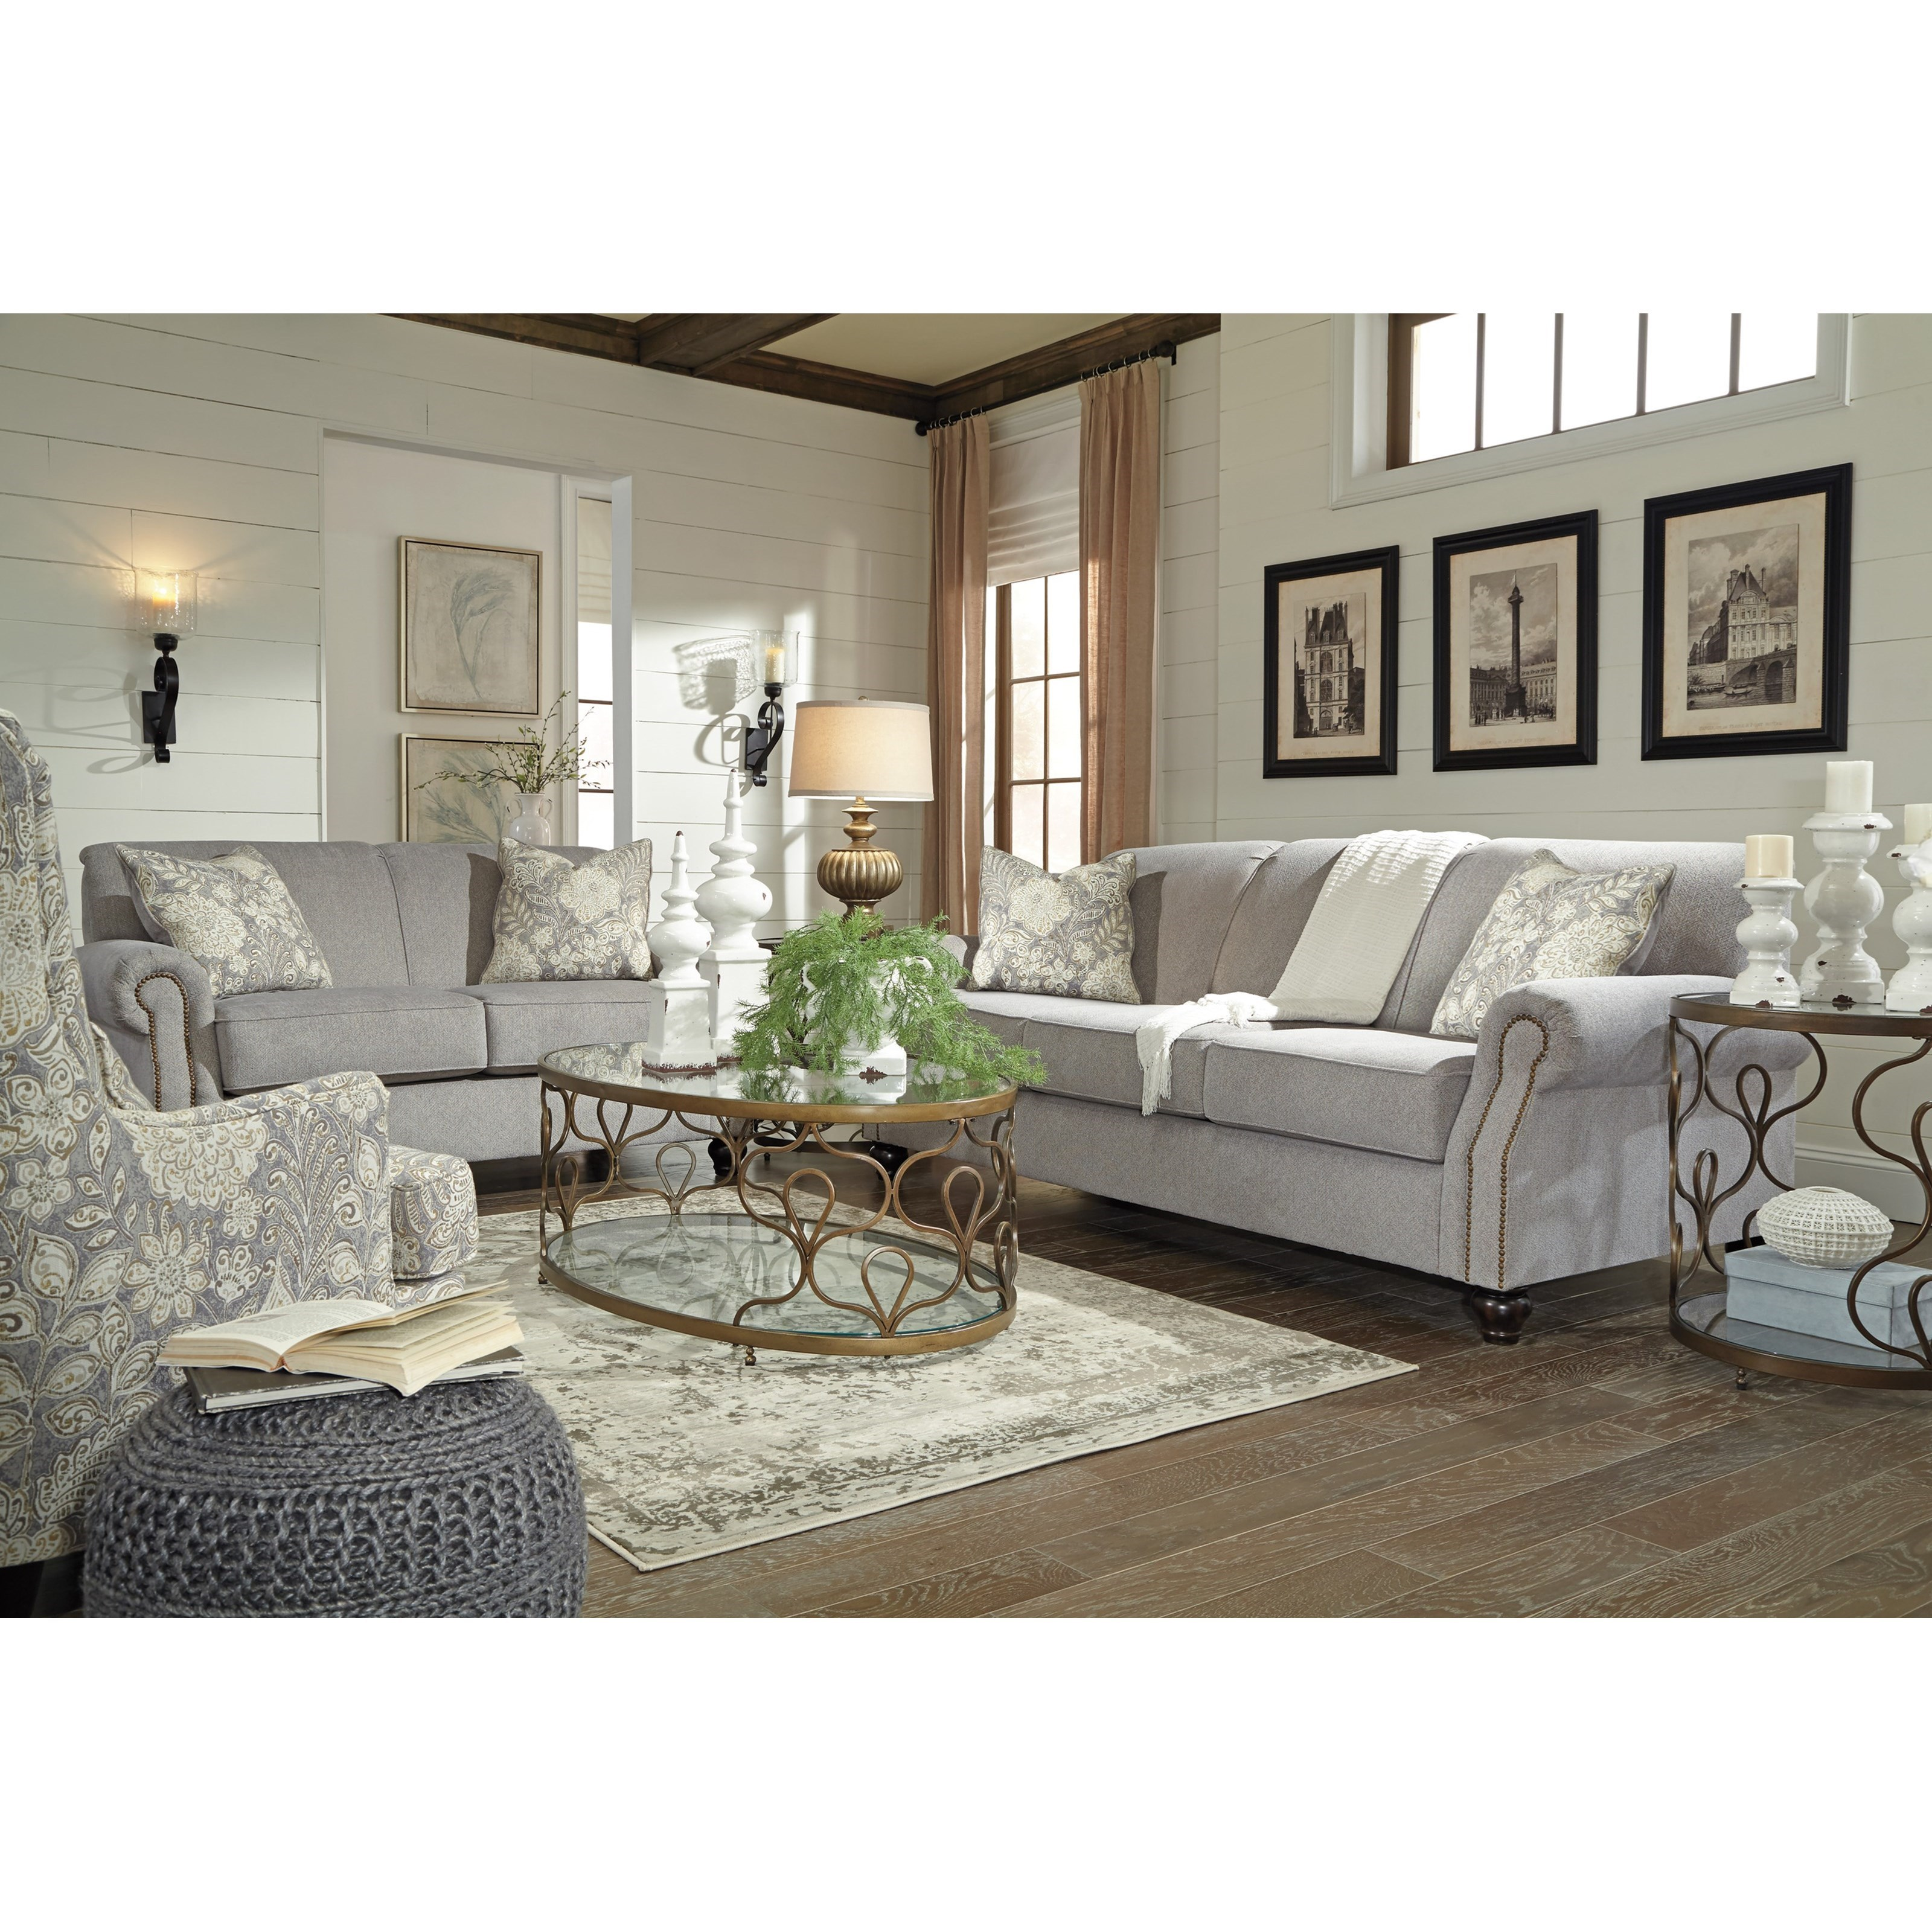 Benchcraft Avelynne Stationary Living Room Group - Item Number: 81302 Living Room Group 2